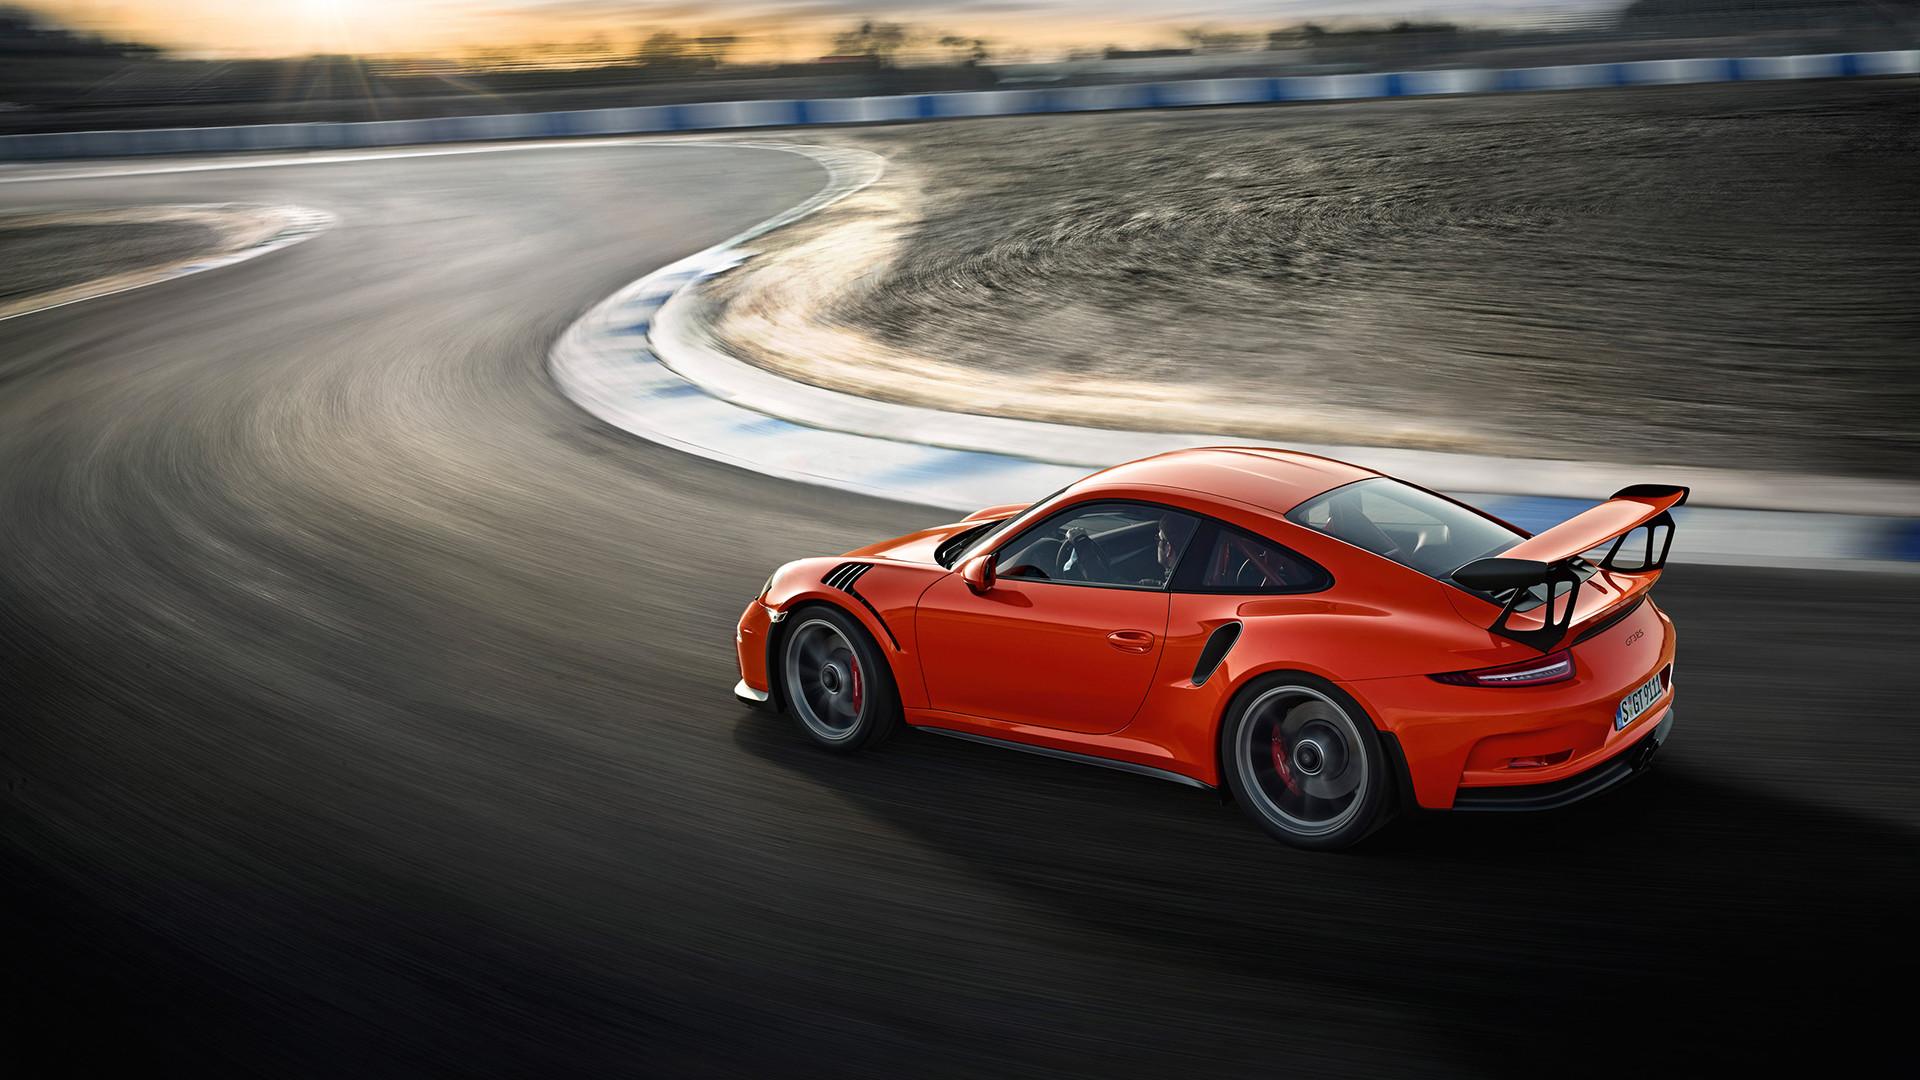 Porsche 911 Gt3 Rs Wallpaper: Porsche 911 Gt3 Rs Wallpaper ·① WallpaperTag